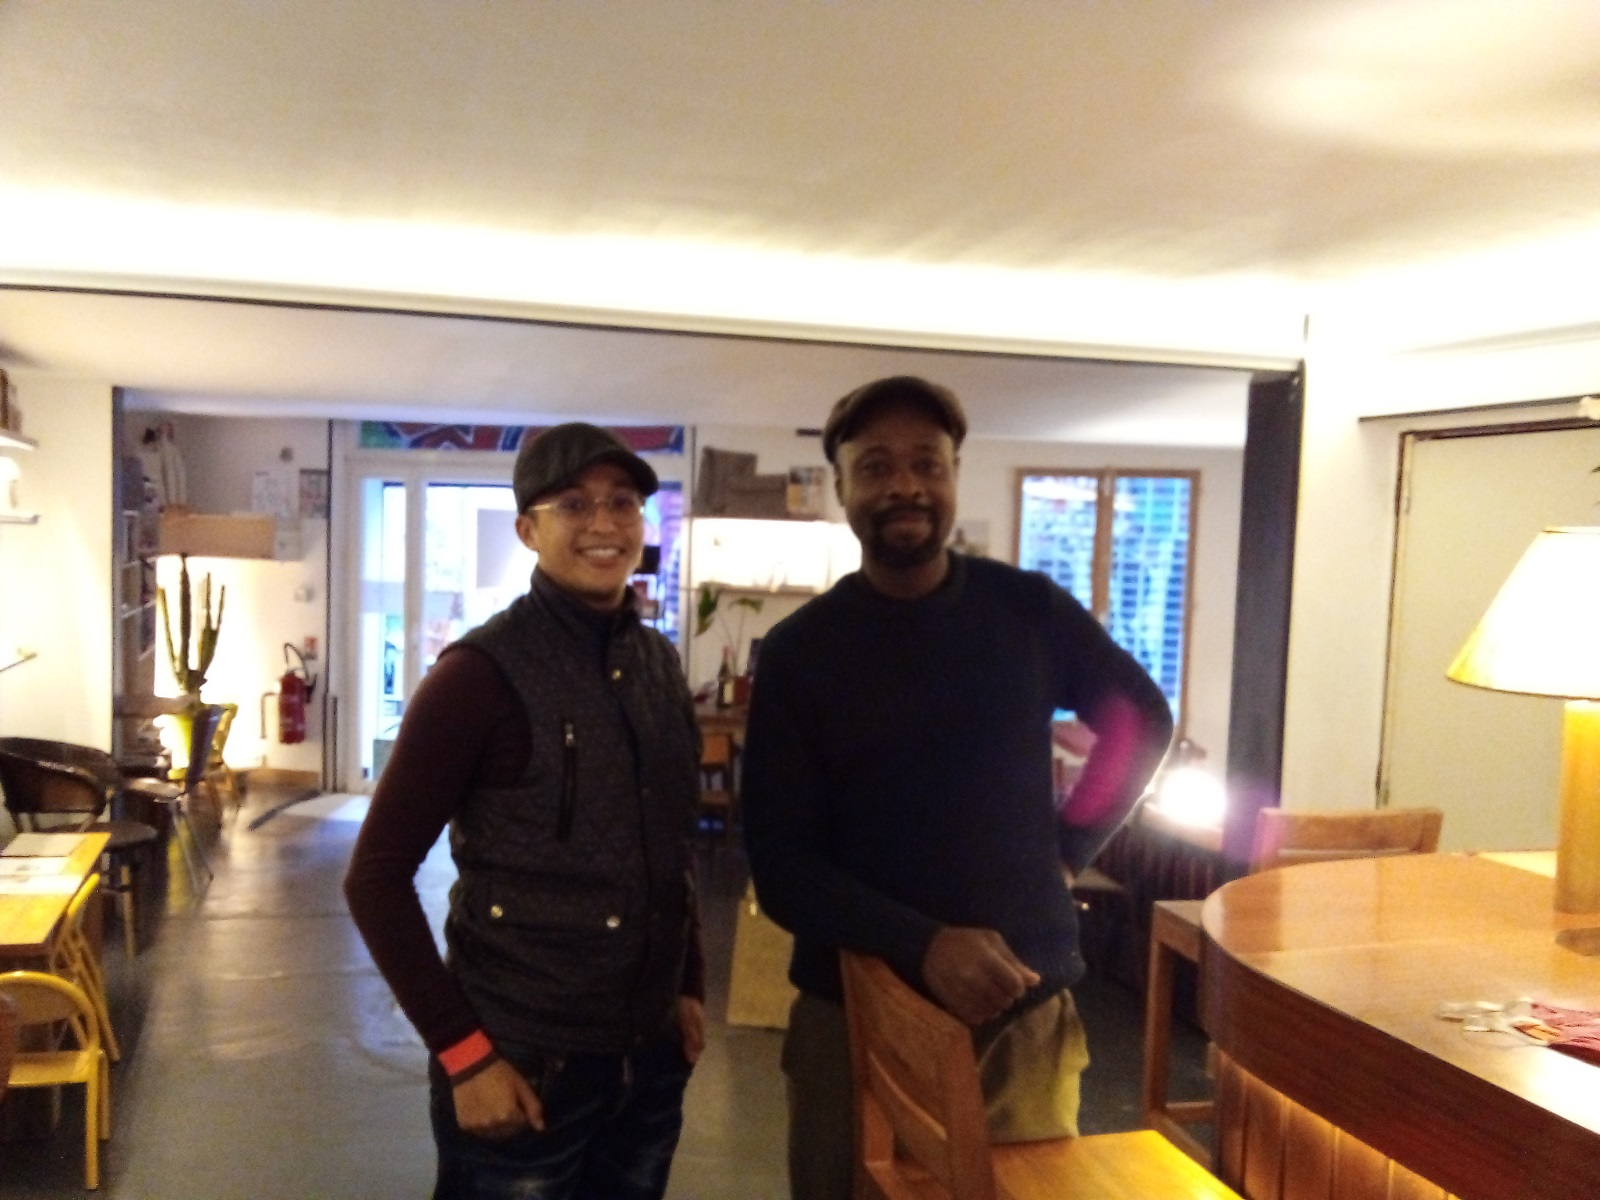 Abram Ag Sidiyene et Justin De Gonzague au local Ekonature